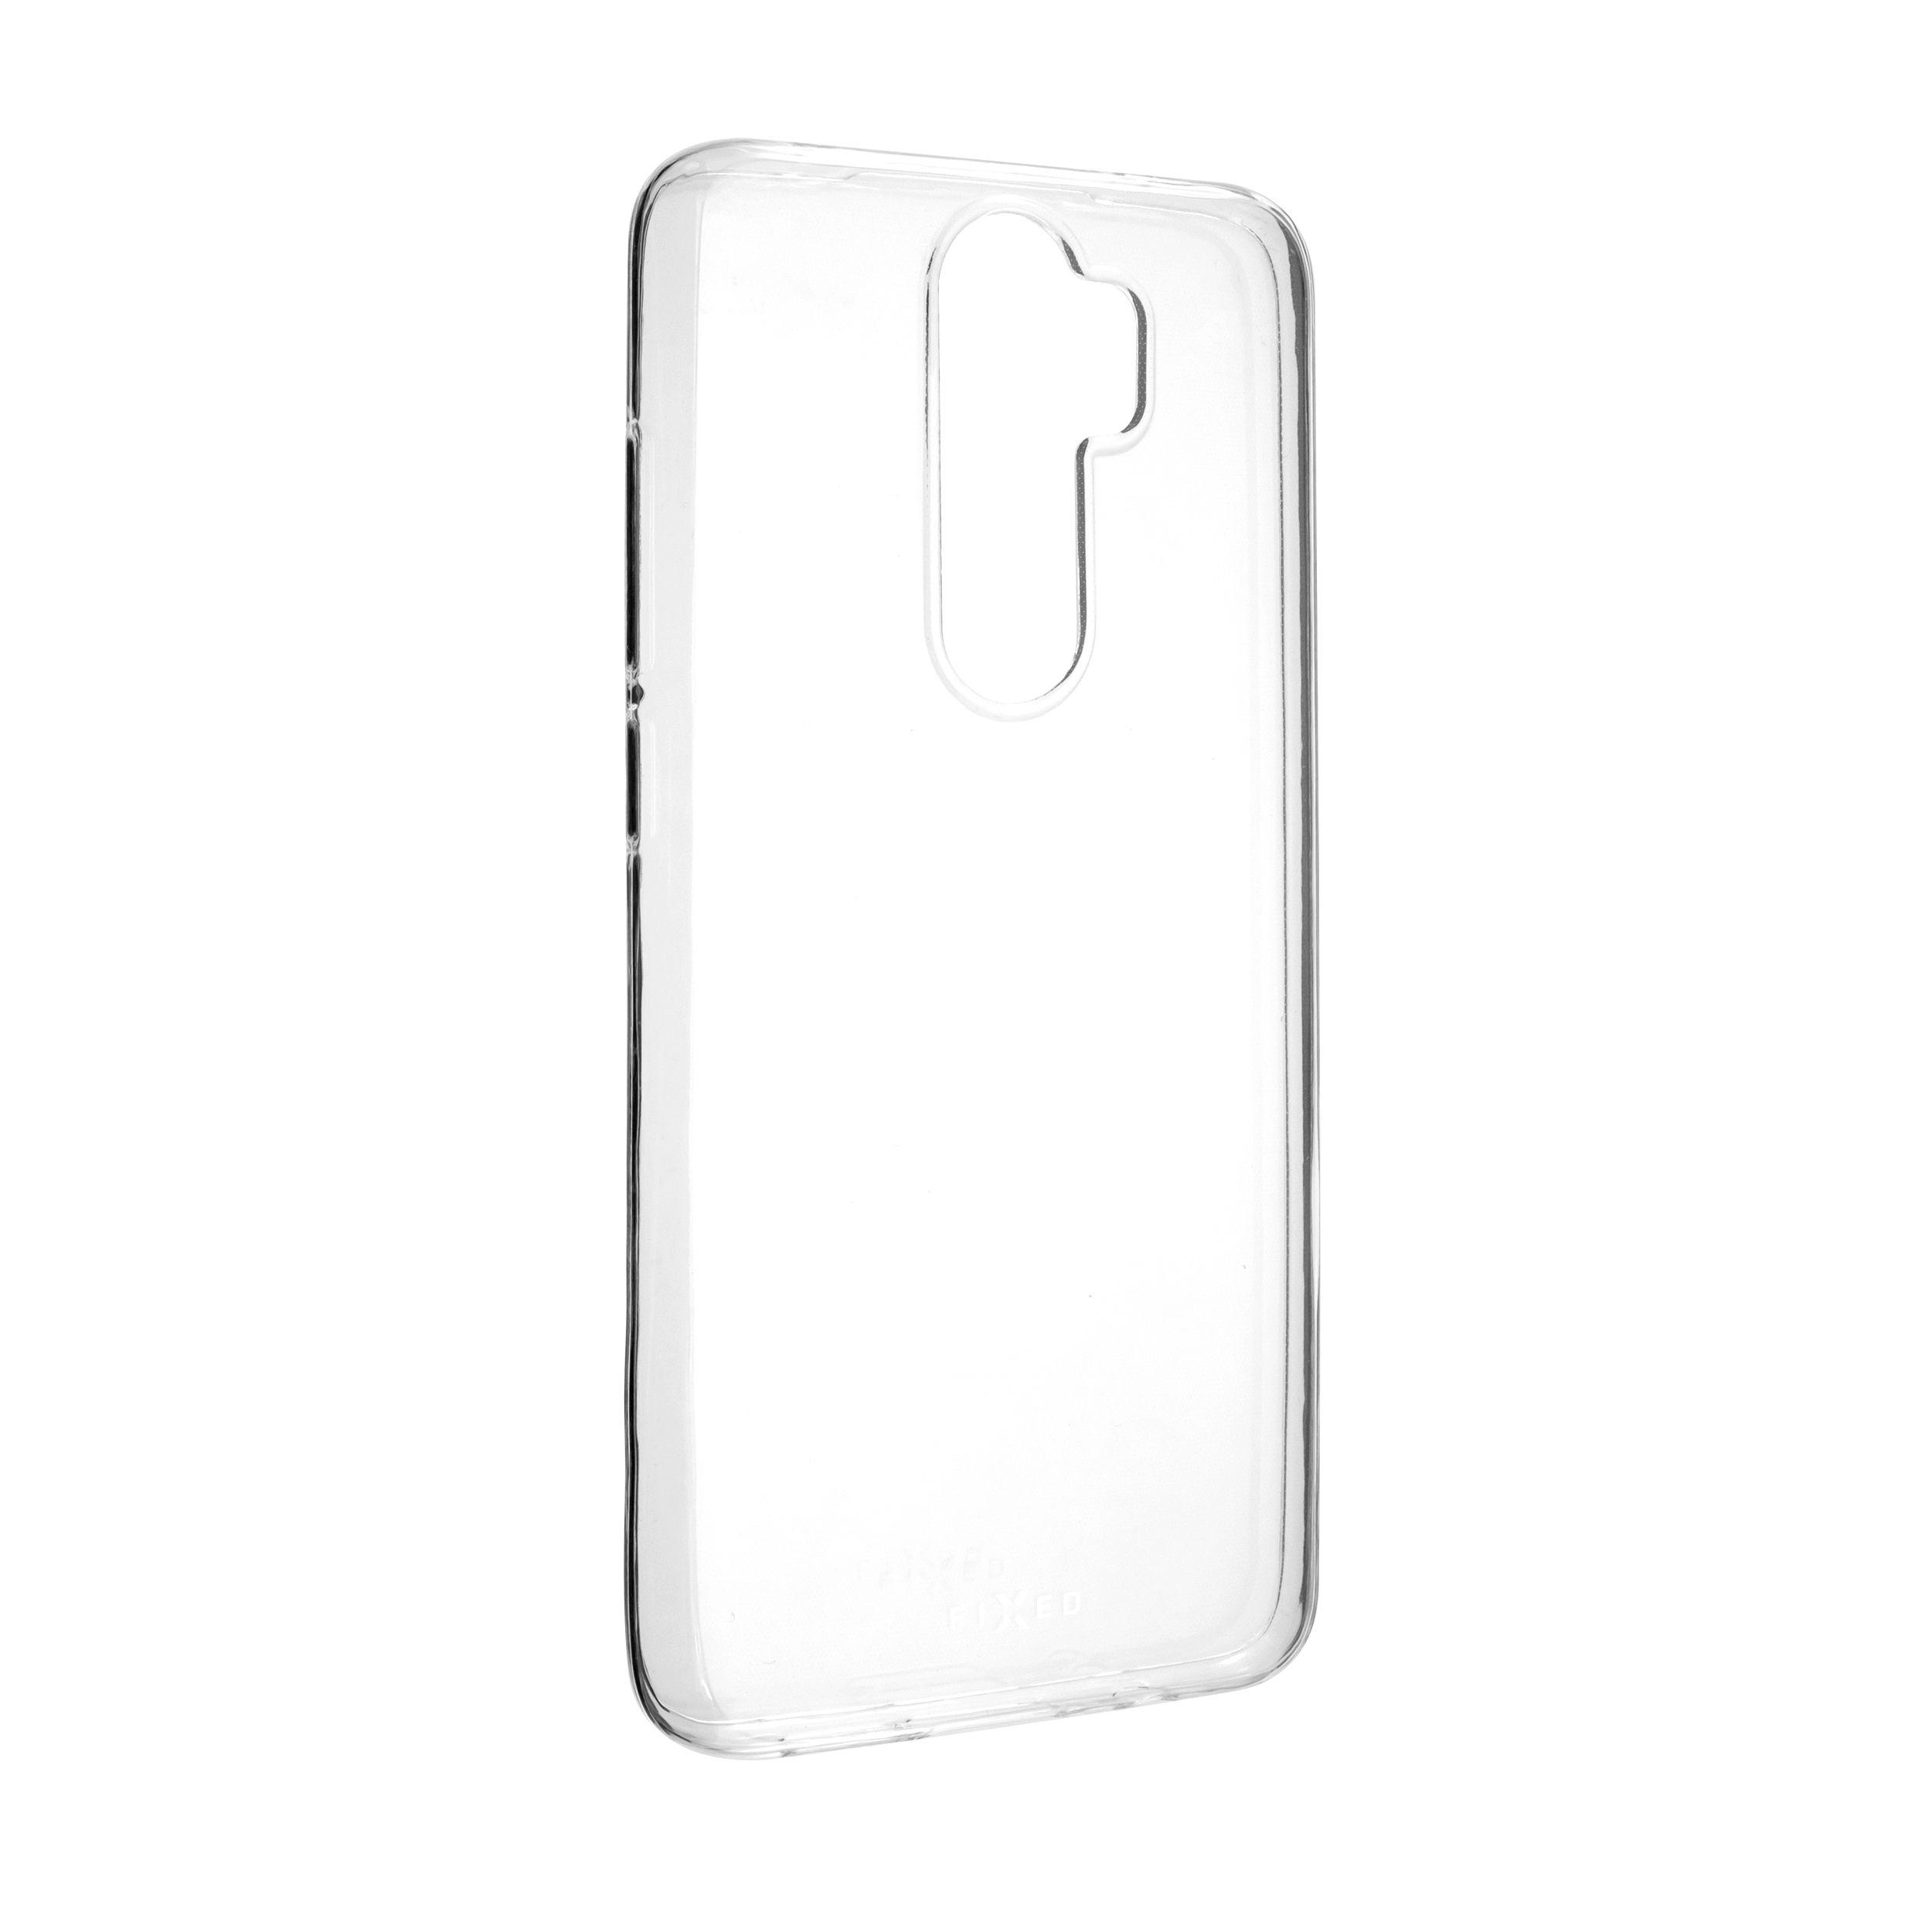 Ultratenké TPU gelové pouzdro FIXED Skin pro Xiaomi Redmi Note 8 Pro, 0,6 mm, čiré